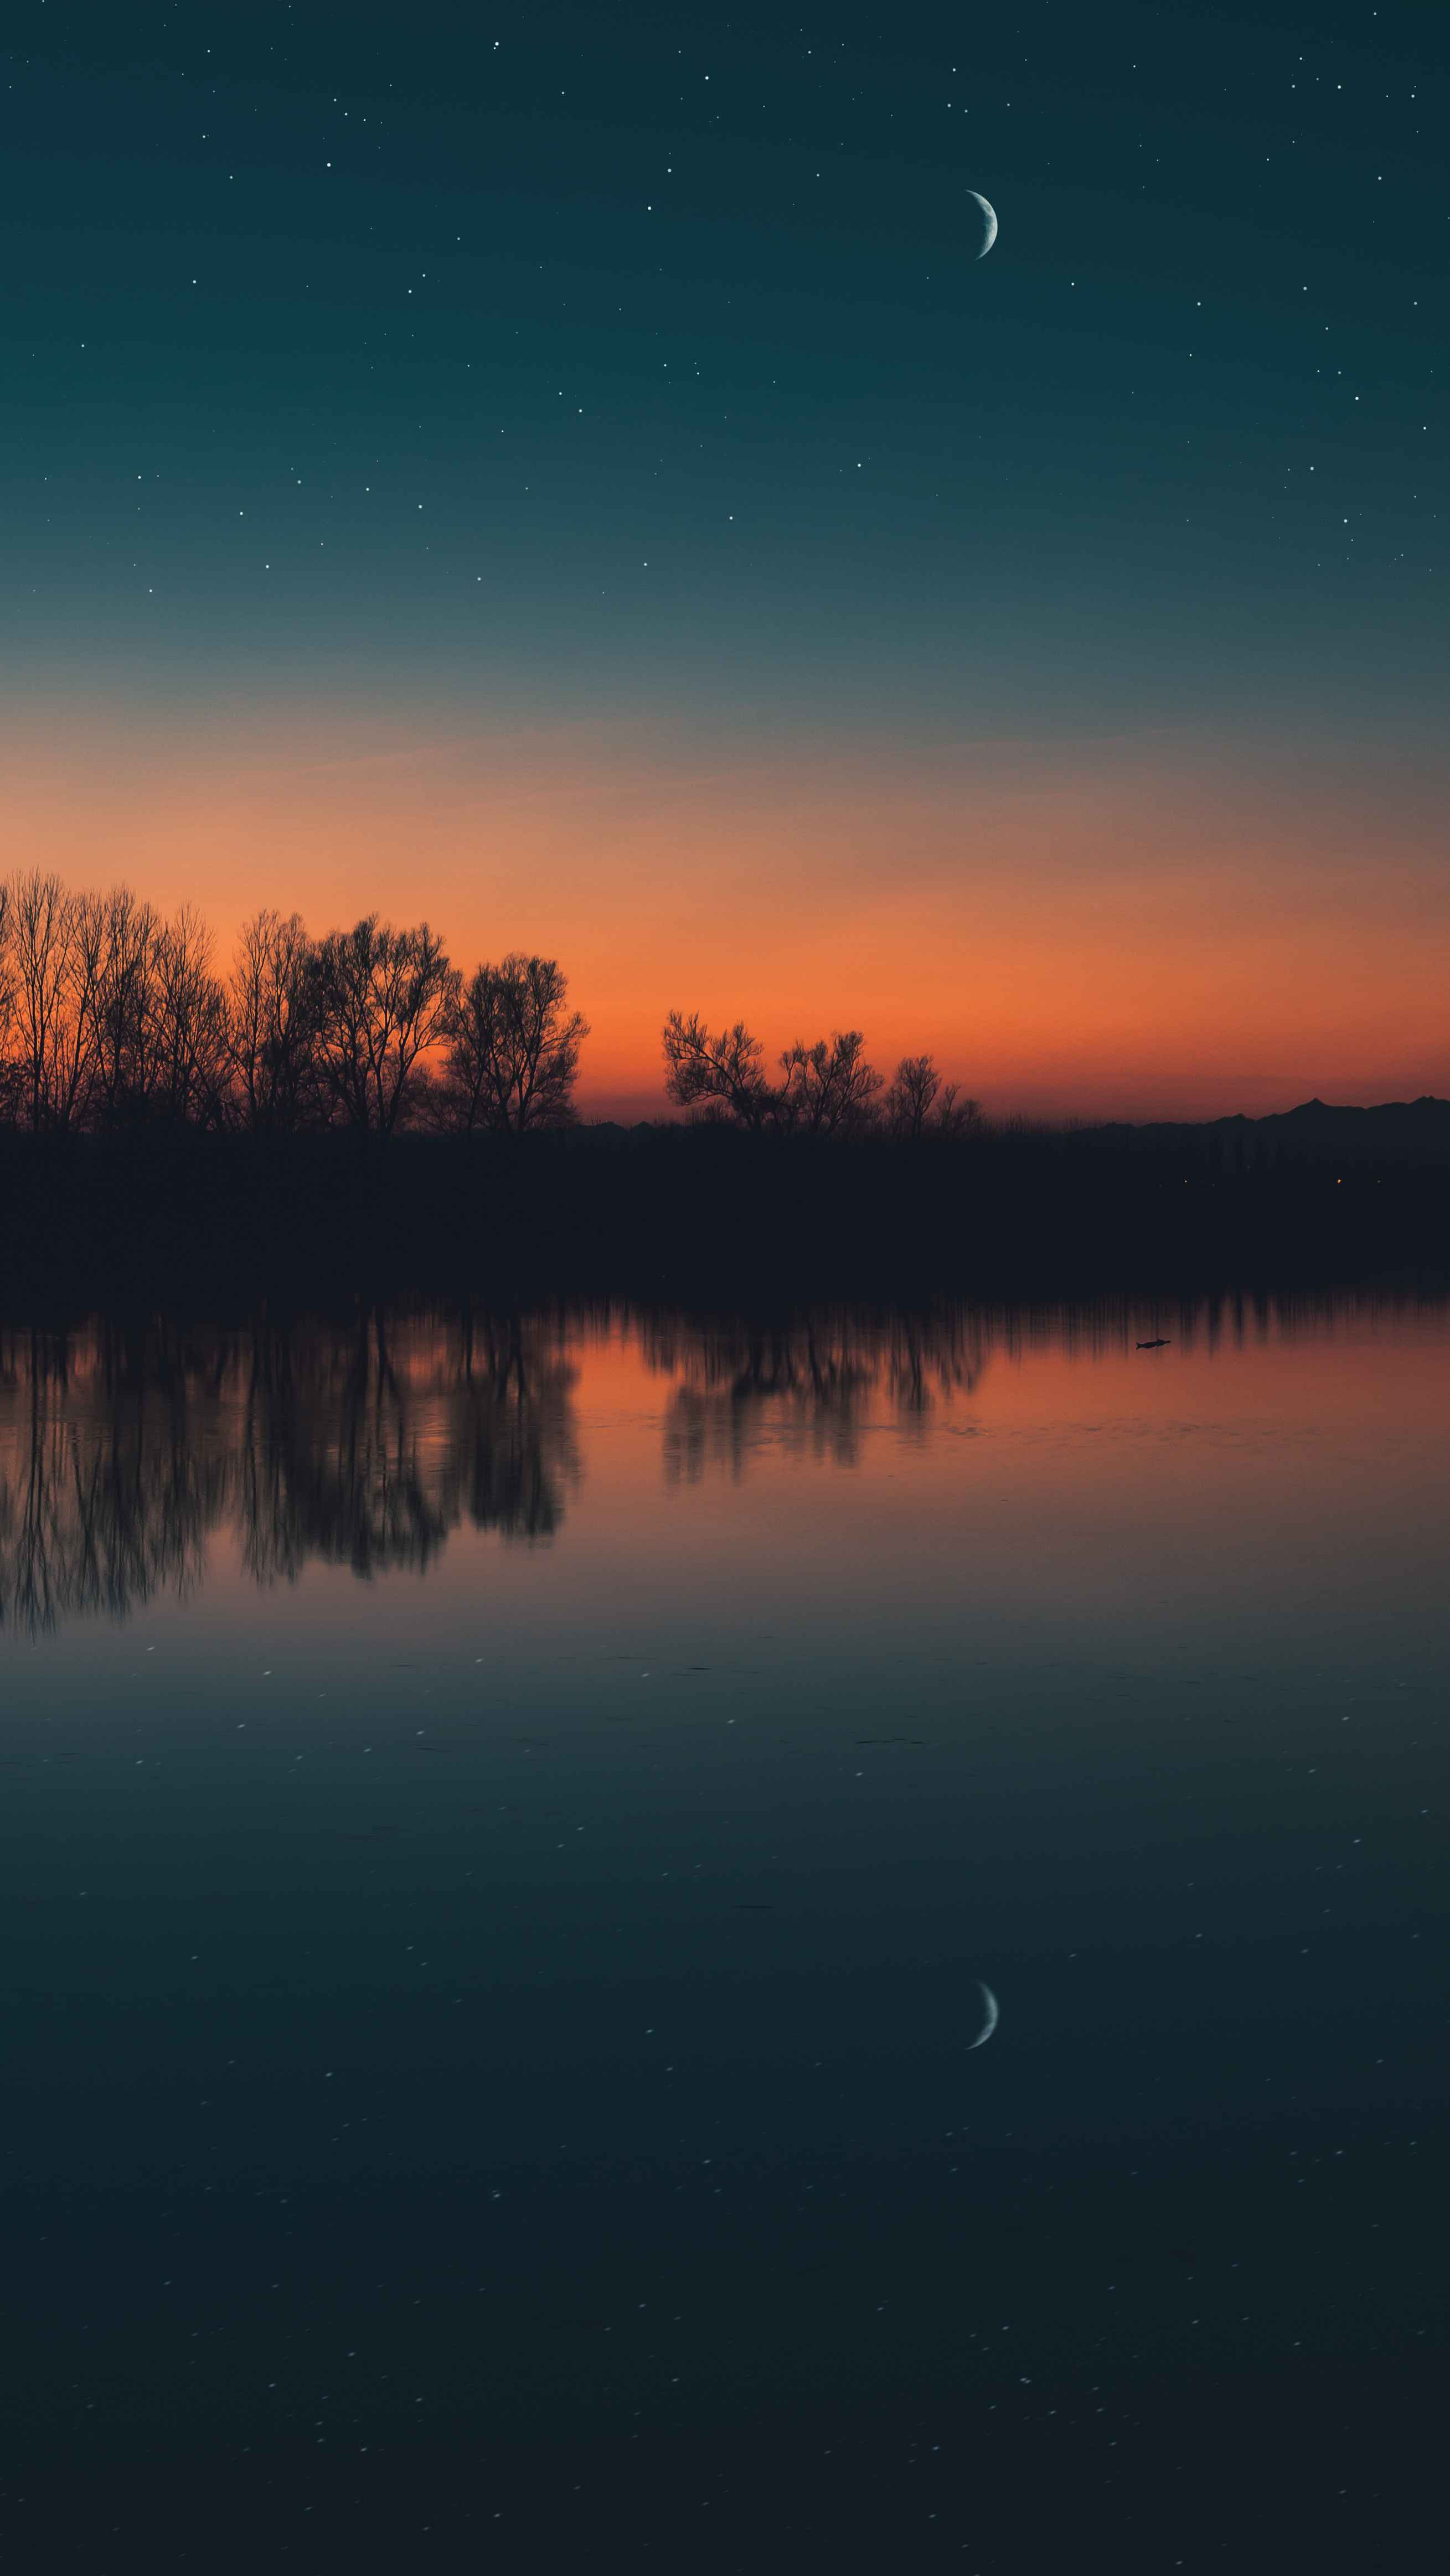 Lake Reflection Evening Moon iPhone Wallpaper